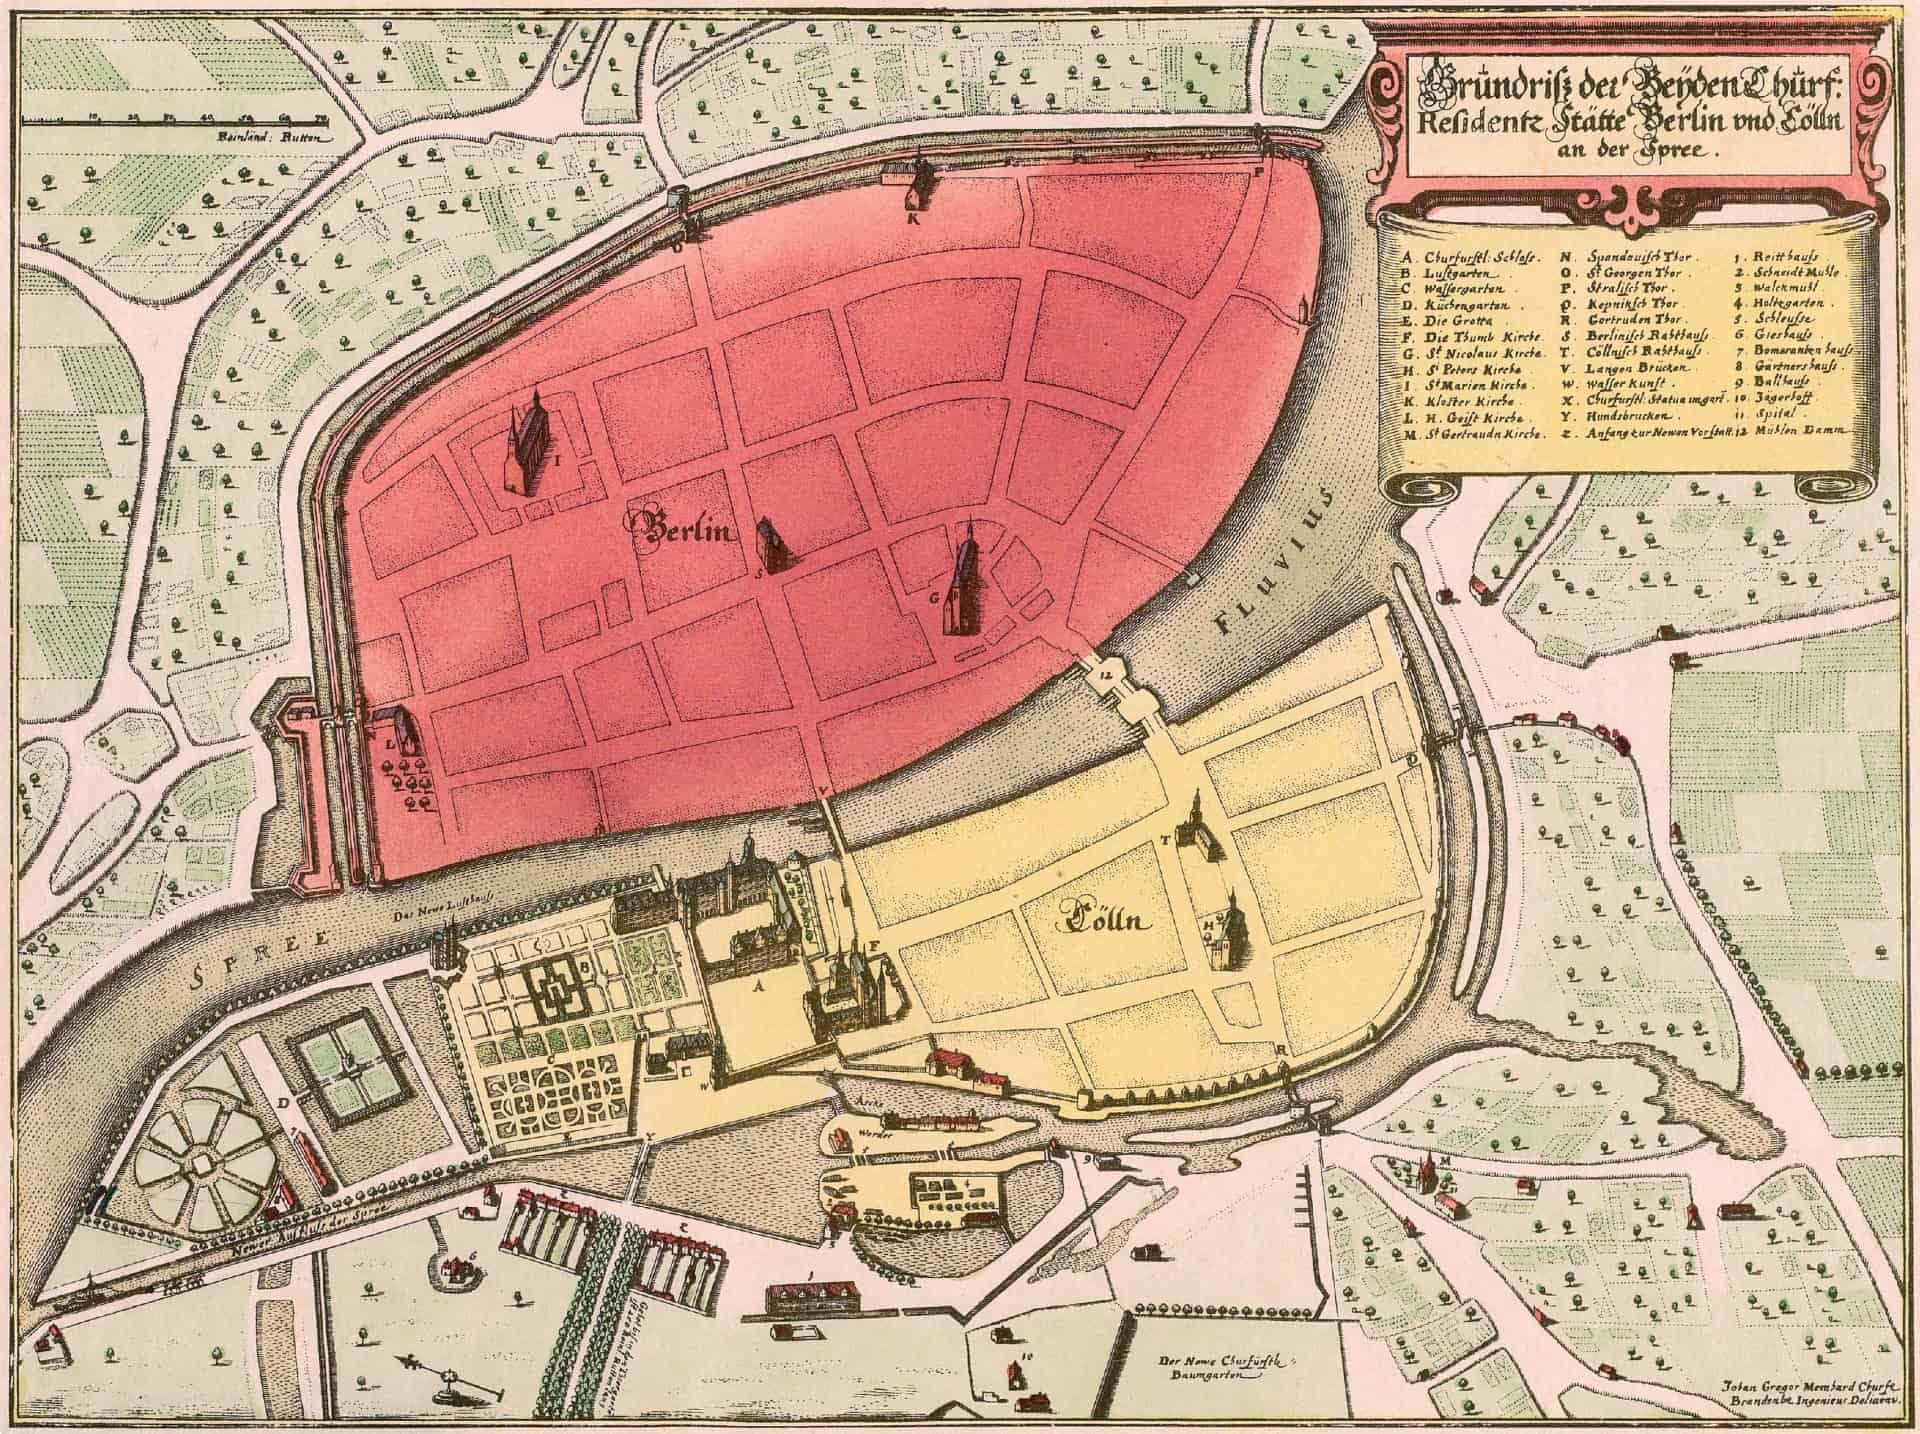 Image of map, Berlin